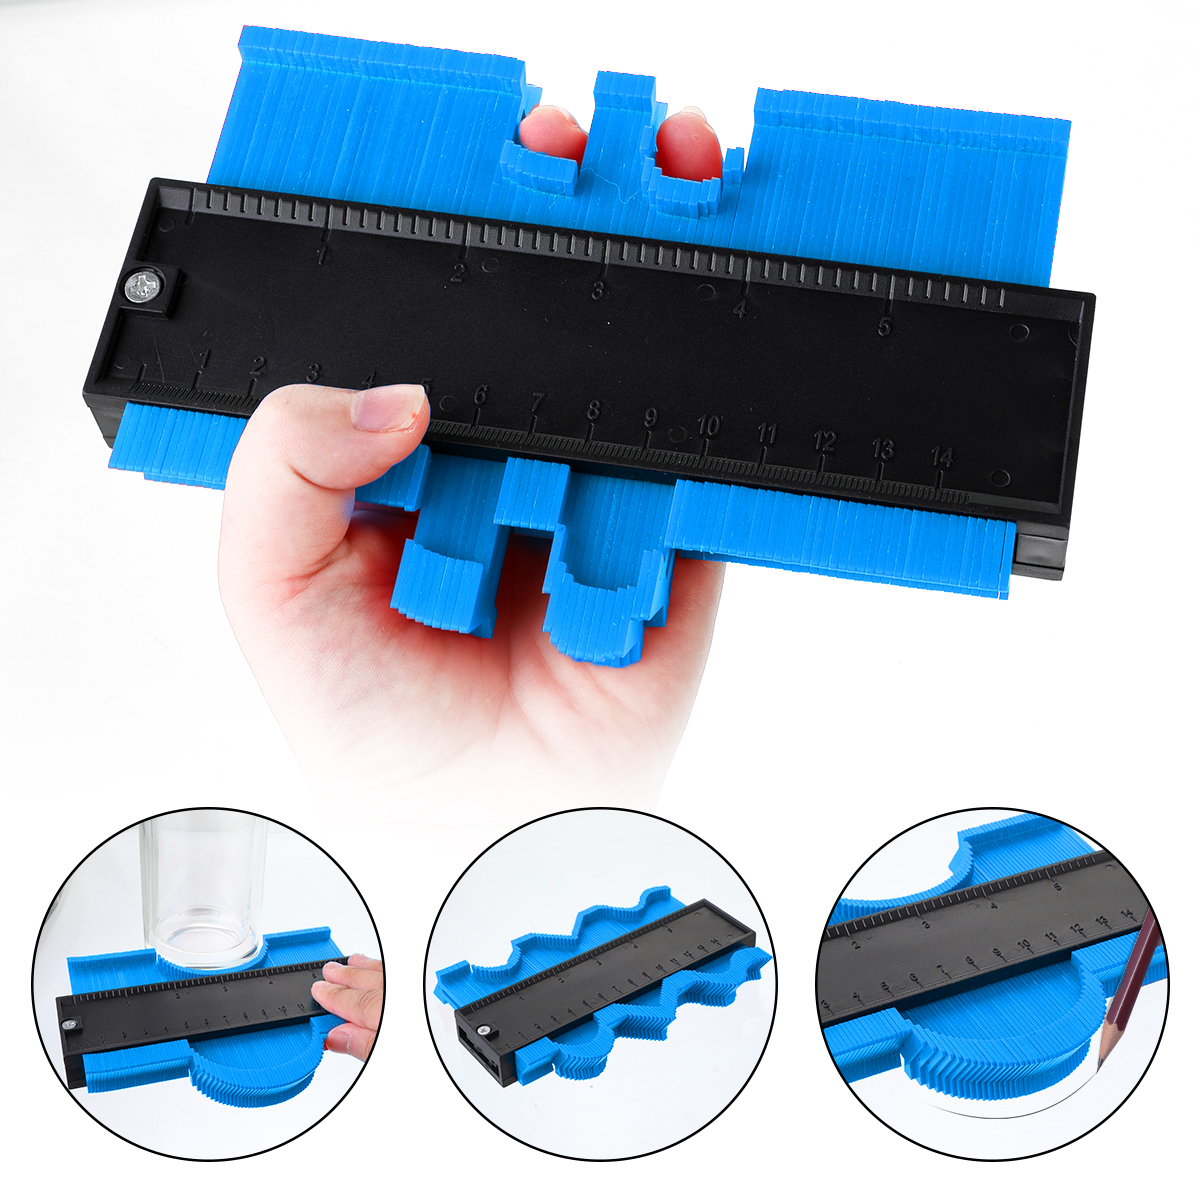 Measure Ruler 5/10 Inch Multi-functio Contour Profile Gauge Tiling Laminate Tiles Edge Shaping Wood ABS Contour Gauge Duplicator